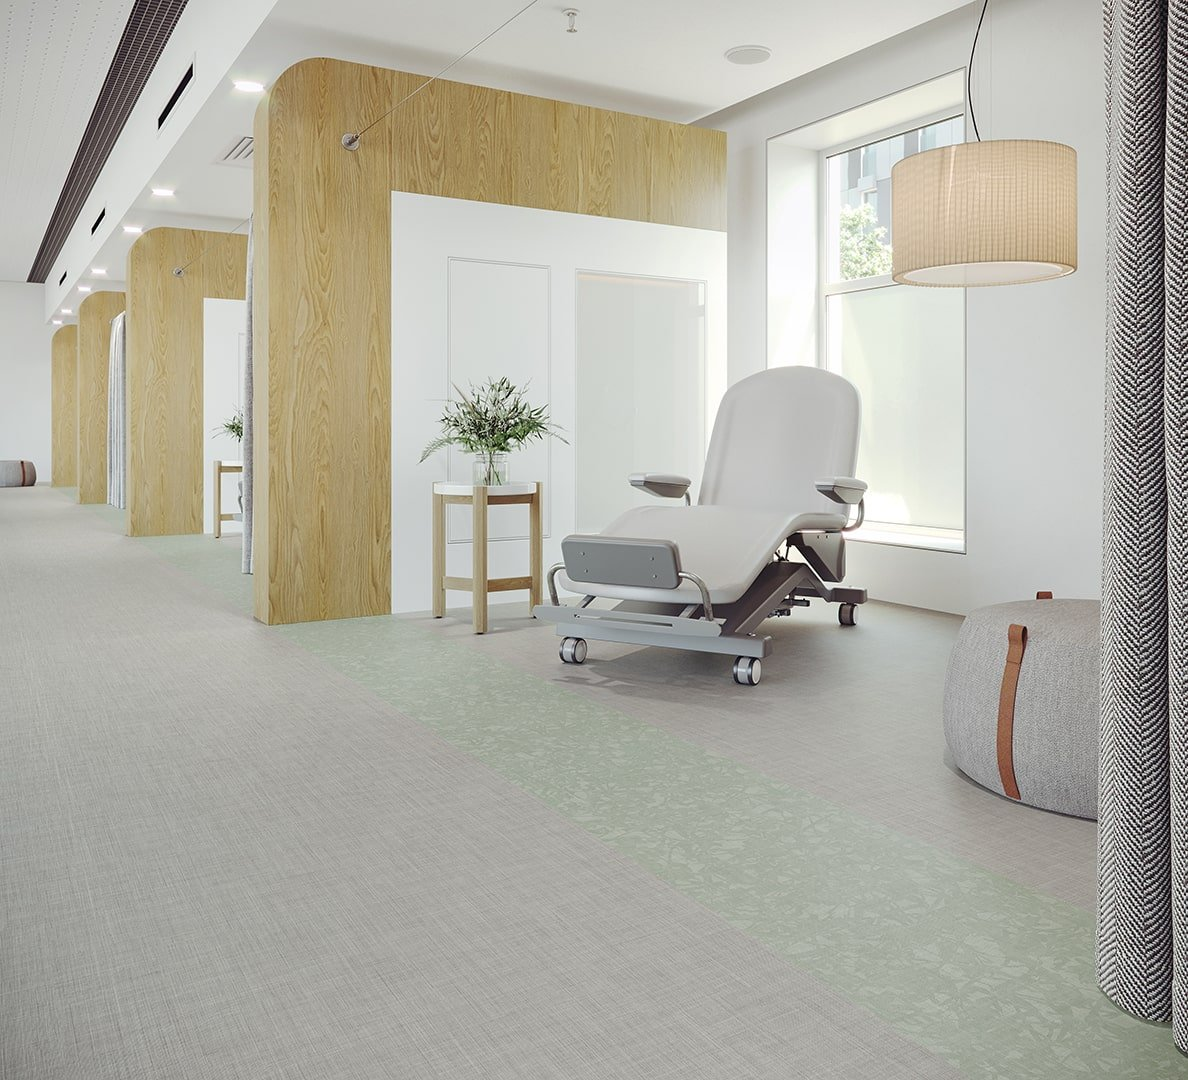 Healthcare Flooring Patient Corridor Bloom_Meander_Seedling_Wellspring_